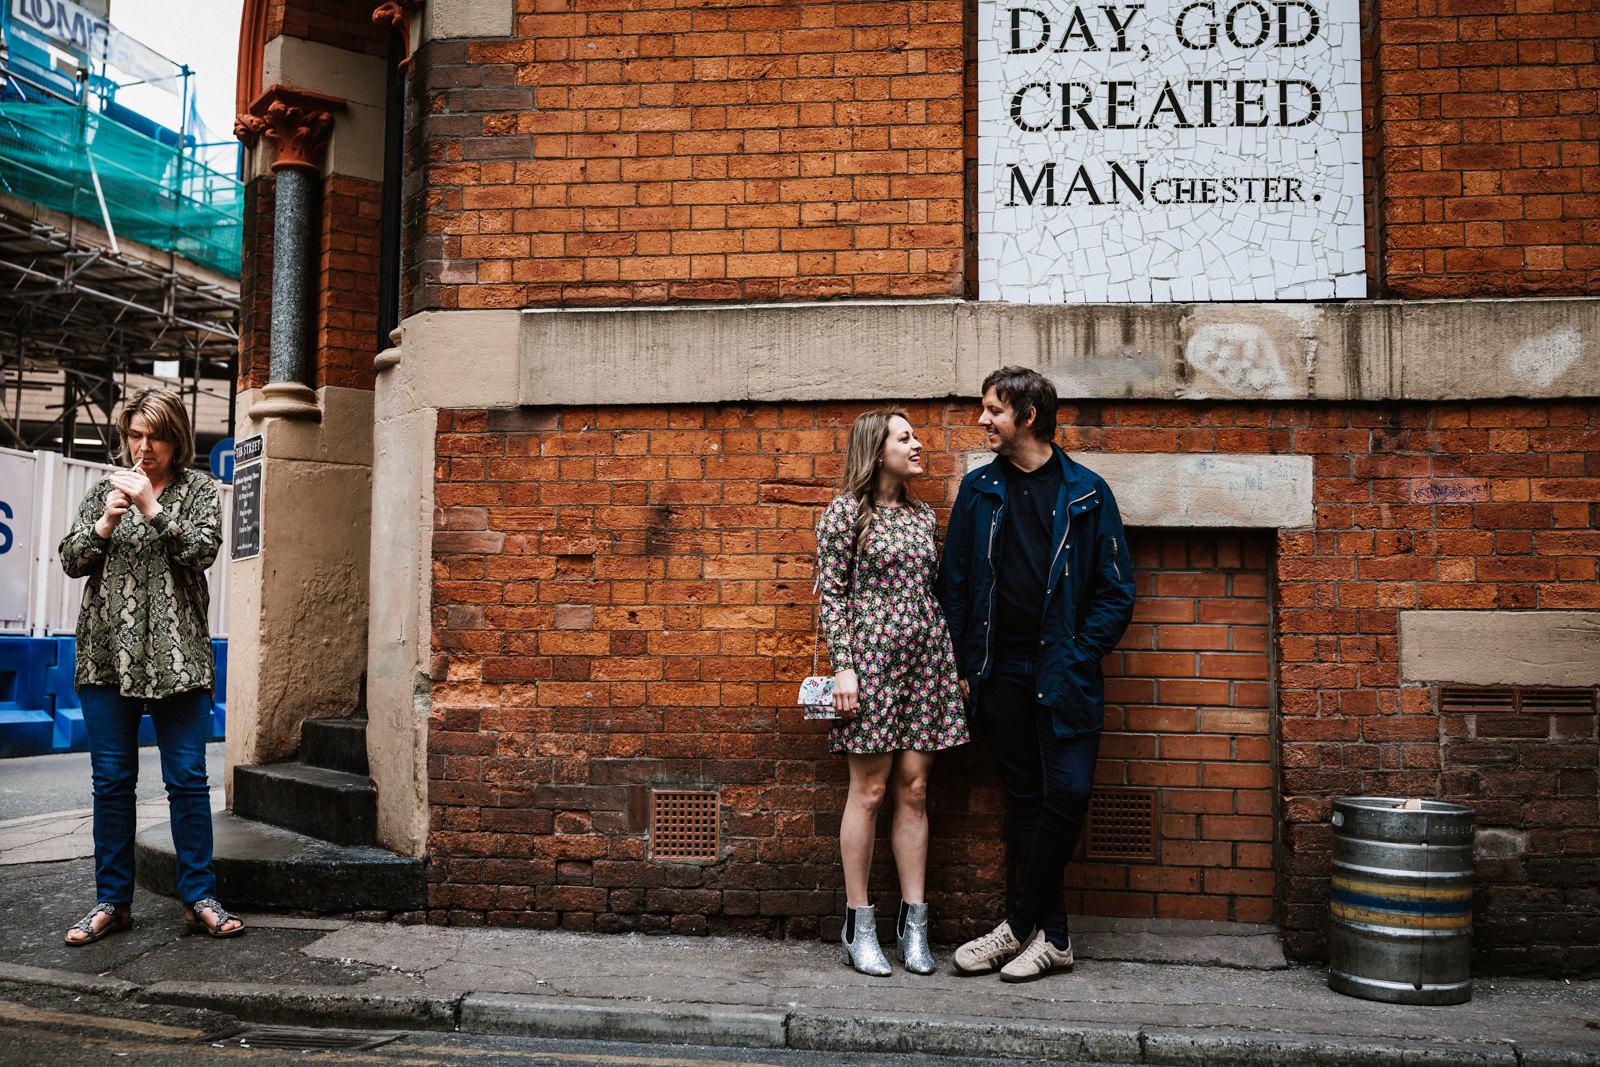 God created Manchester